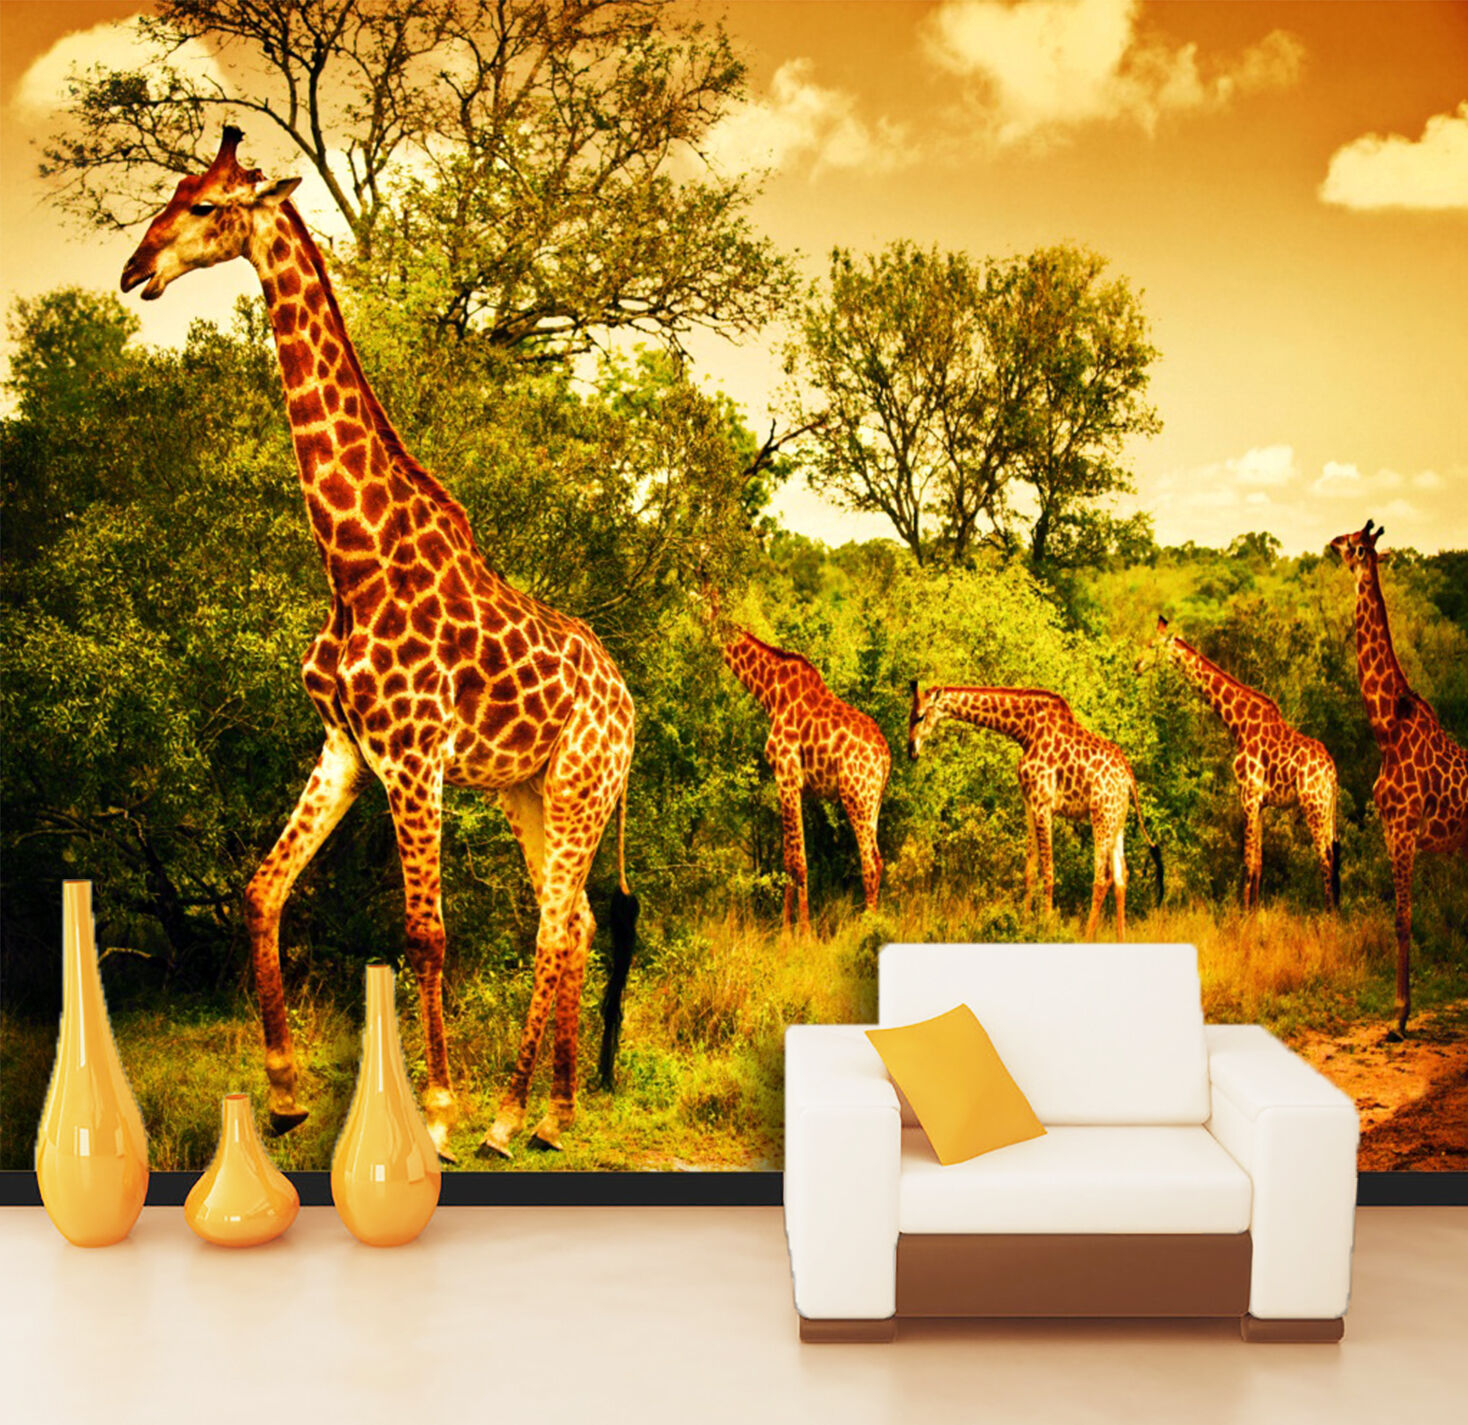 3D Elegant Giraffes 038 WallPaper Murals Wall Print Decal Wall Deco AJ WALLPAPER